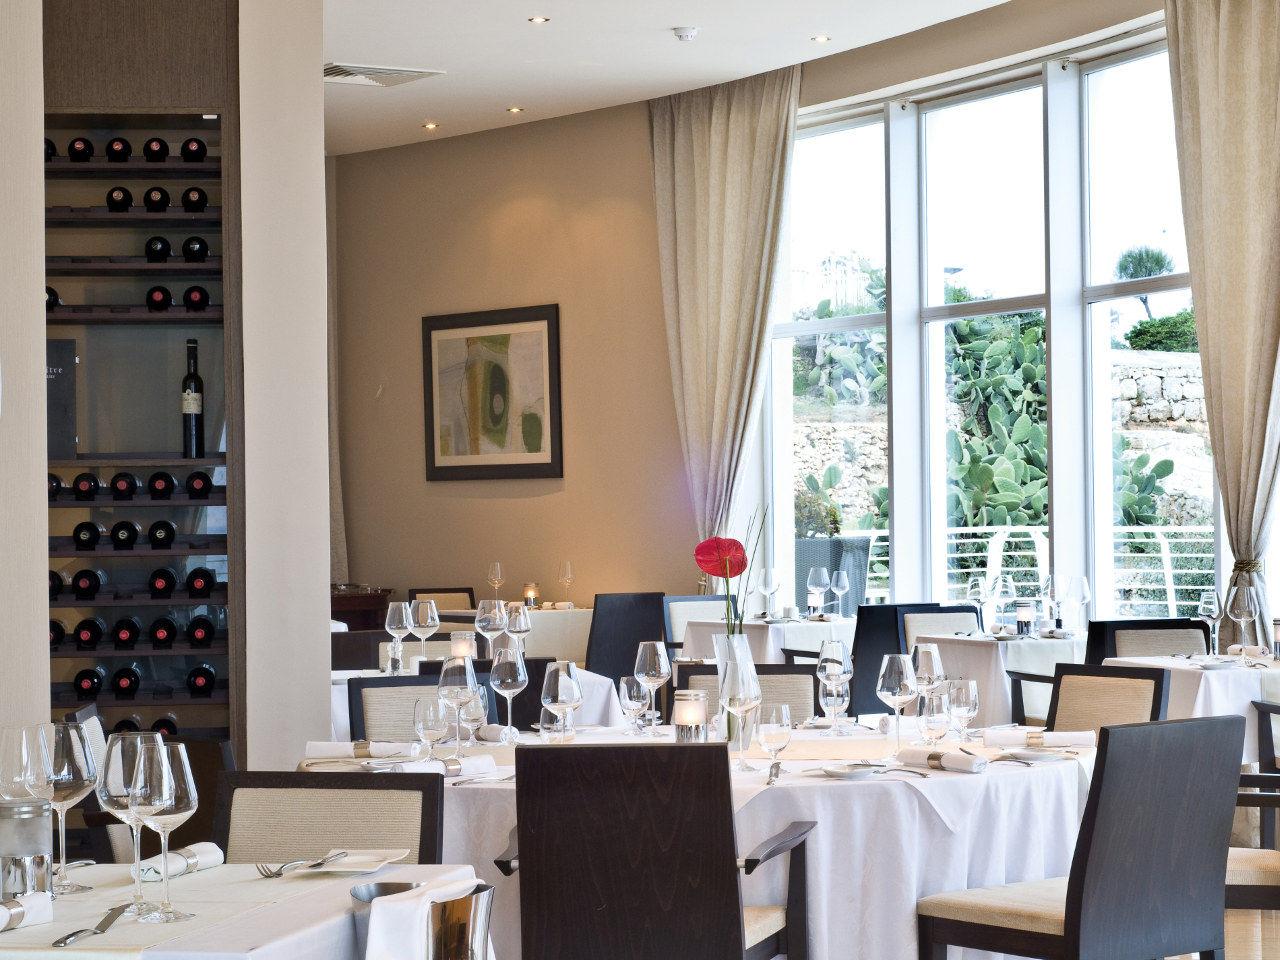 MLAZR-MainGallery-restaurants-bars-3